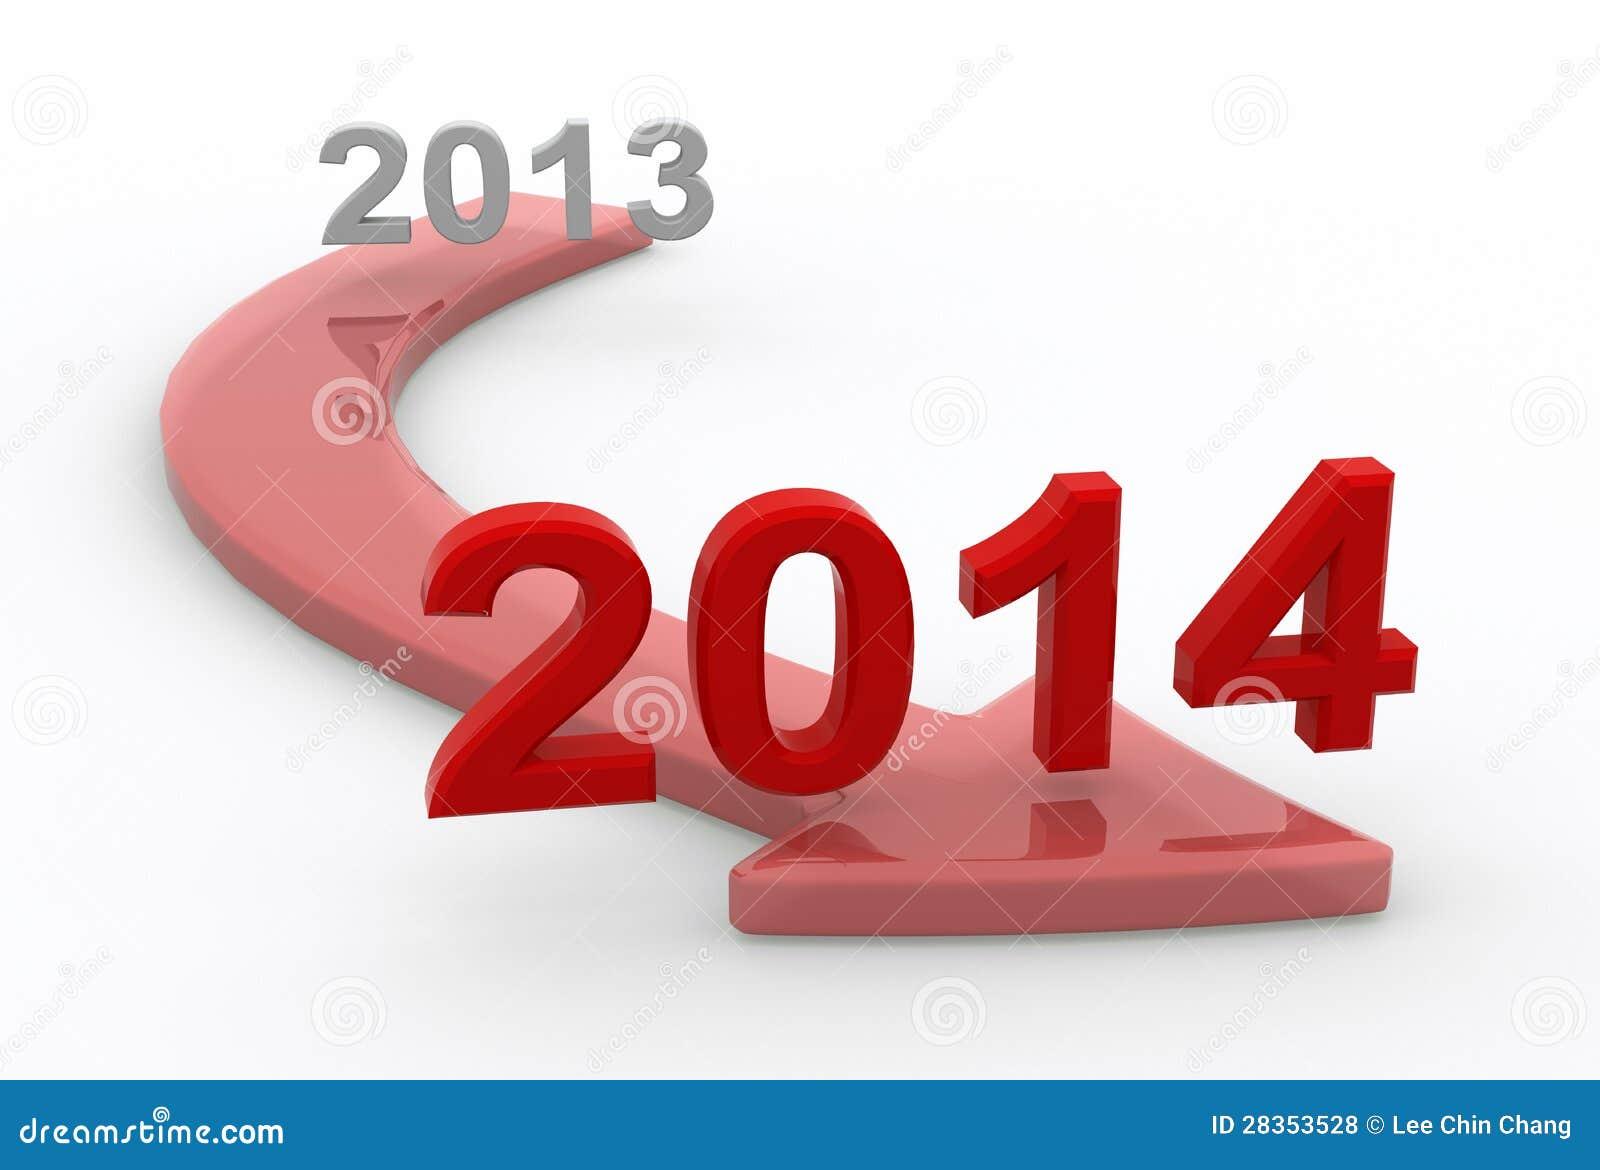 Into 2014